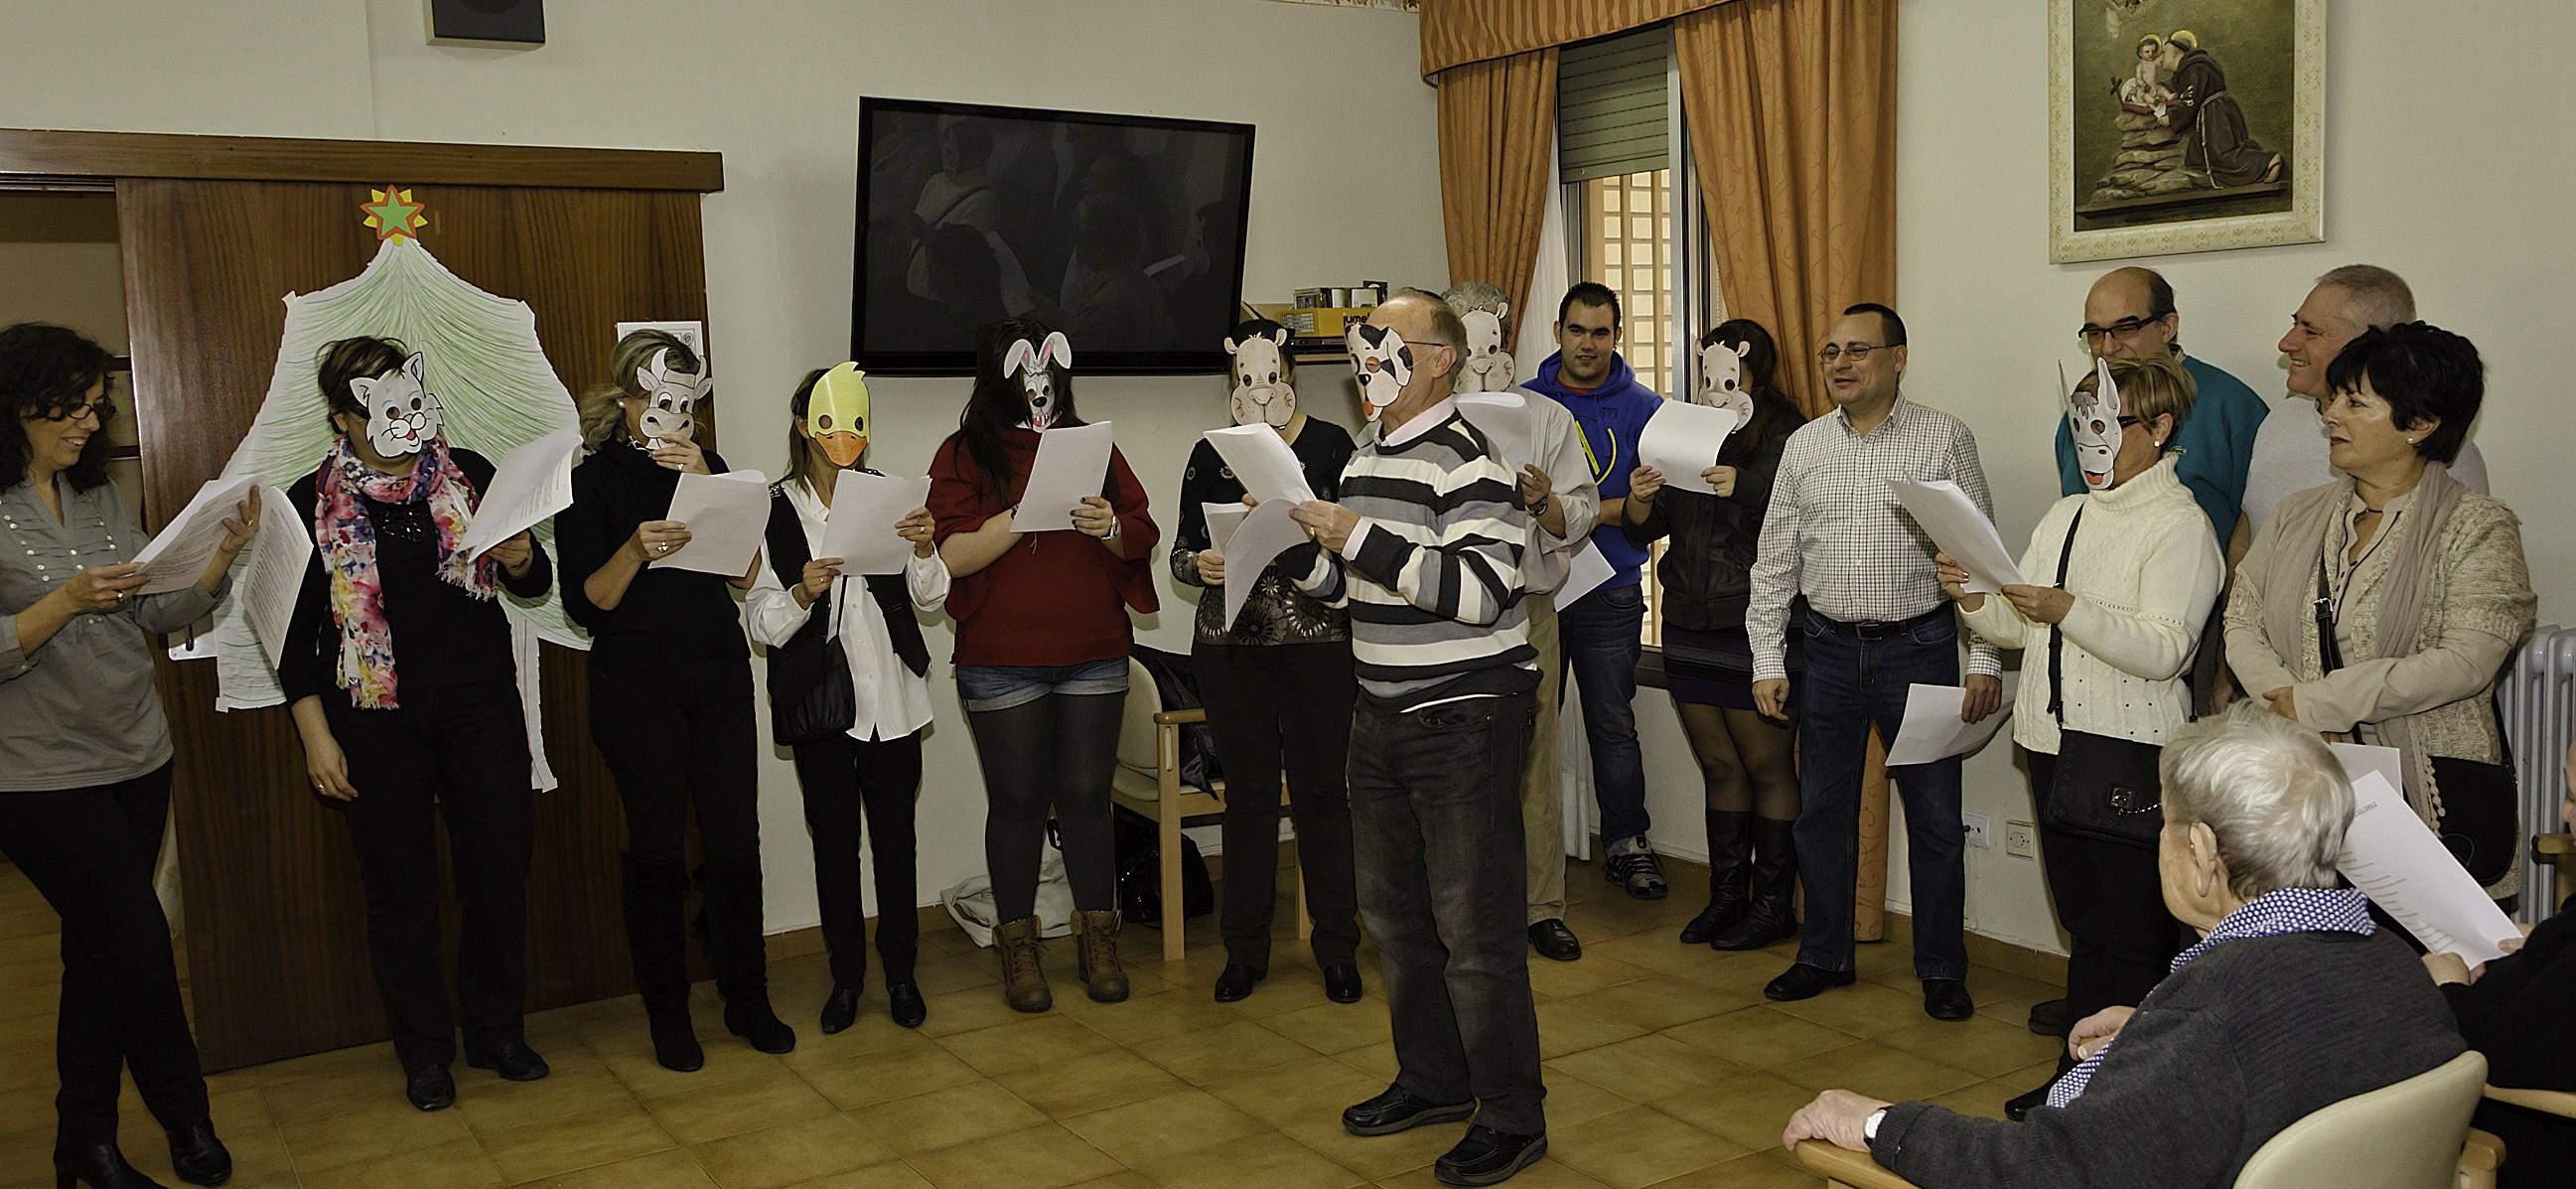 Cofradia Columna Zaragoza – Visita De Navidad En La Residencia